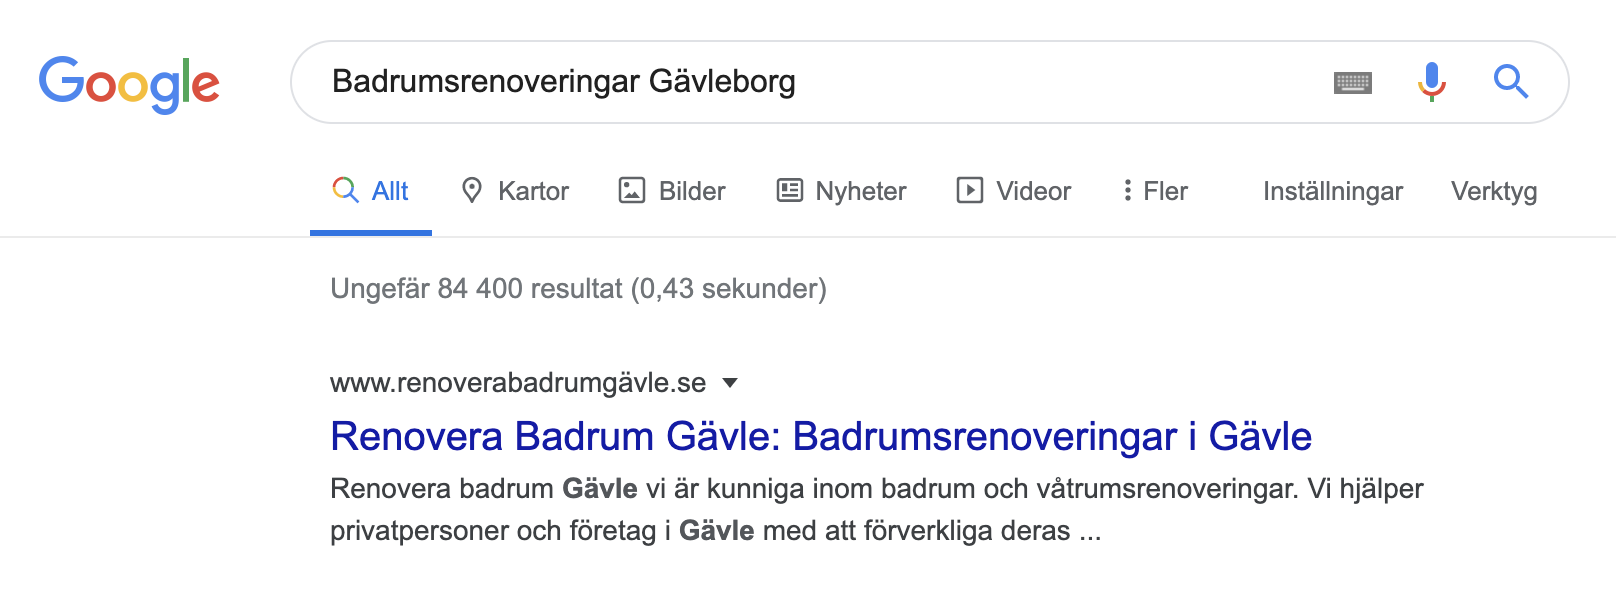 Google Renovera Badrum Gävle